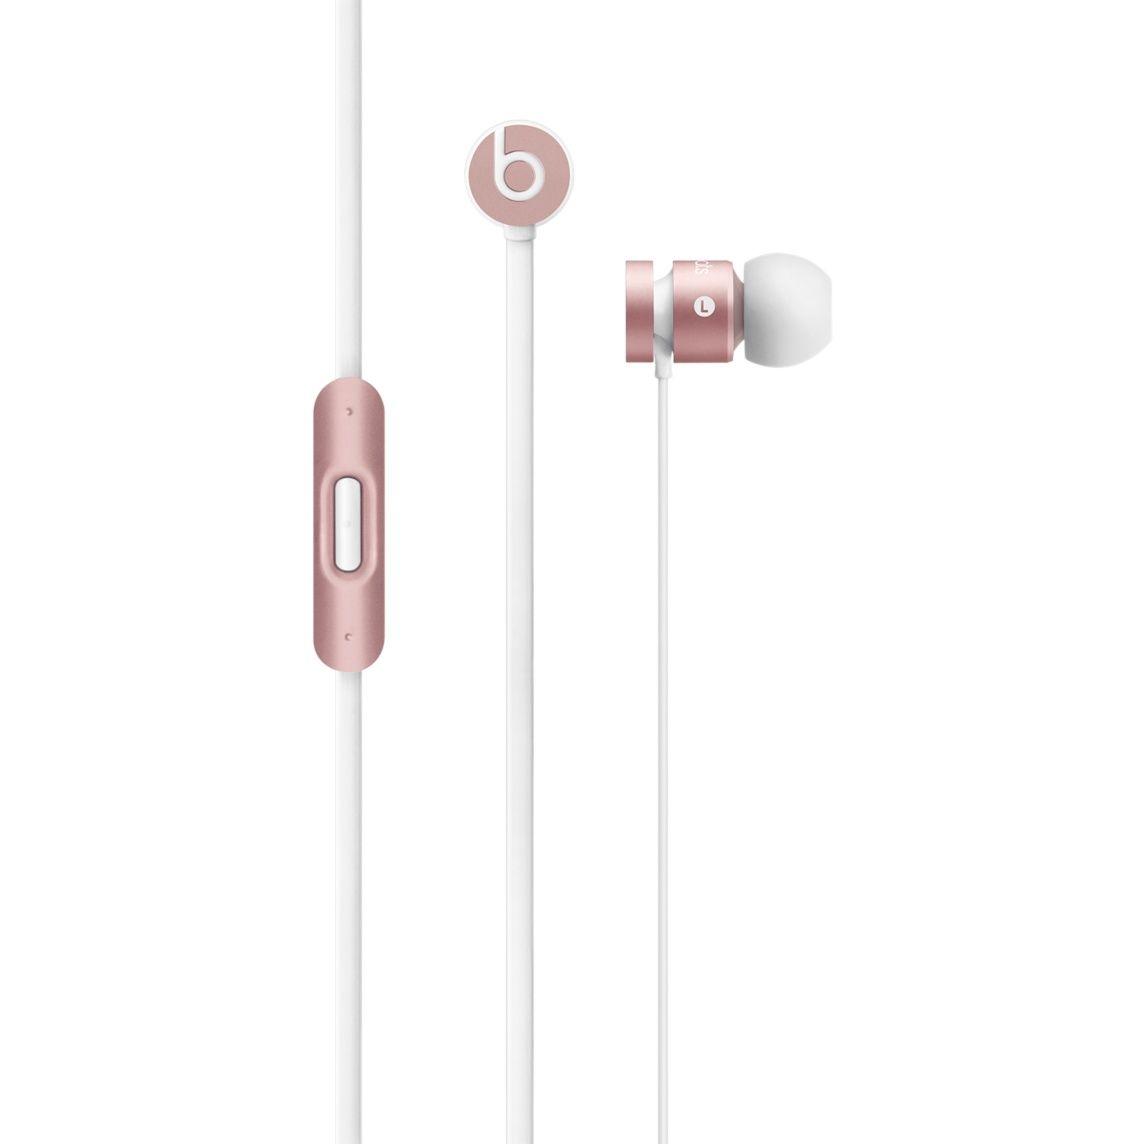 Urbeats In Ear Headphones Space Gray Urbeats Rose Gold Headphones Gold Headphones